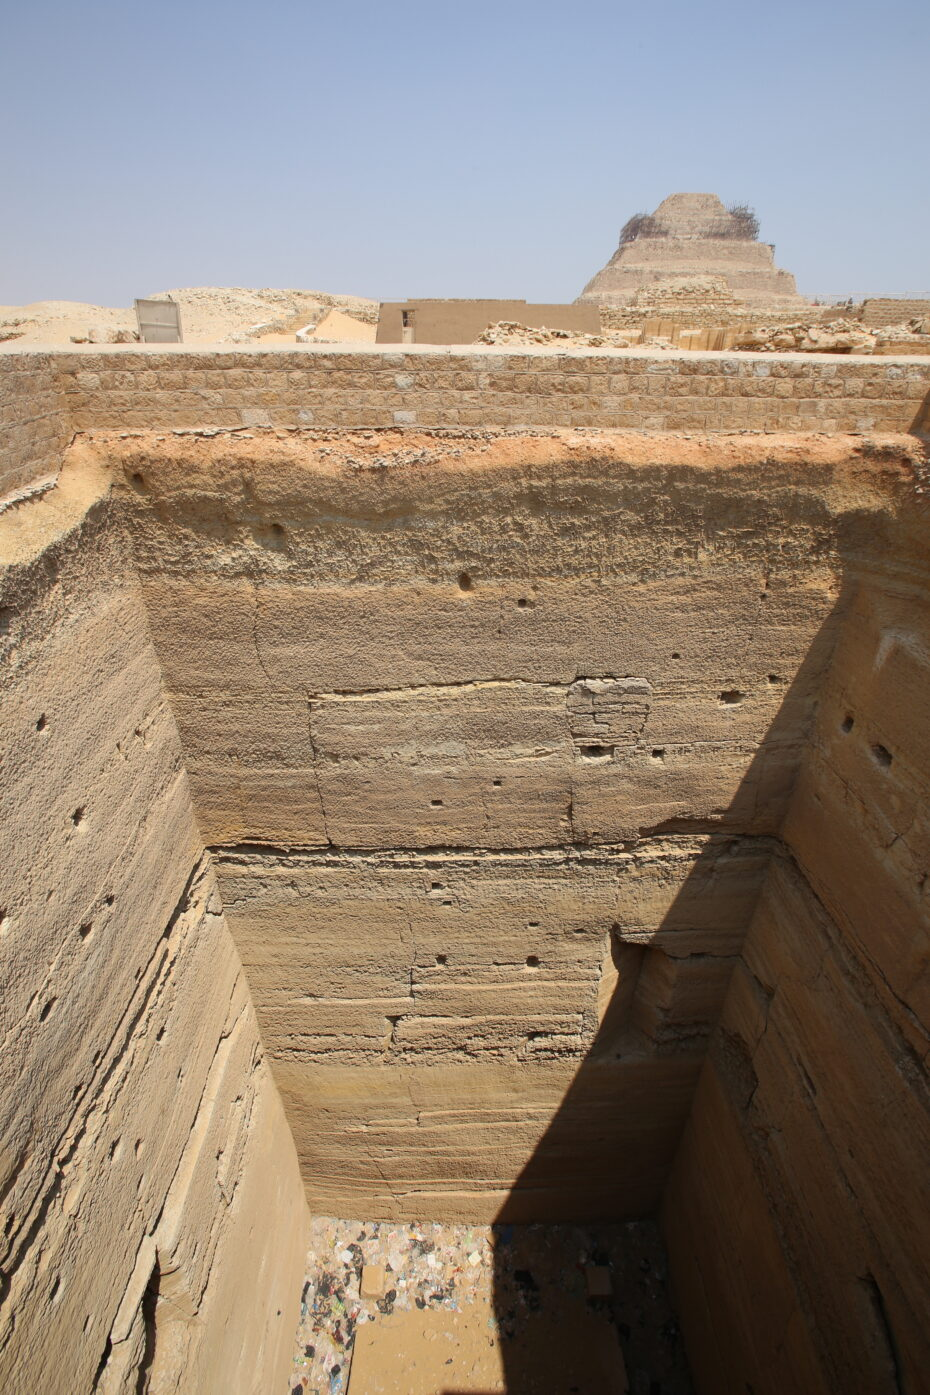 Grain bins of Joseph at Saqqara